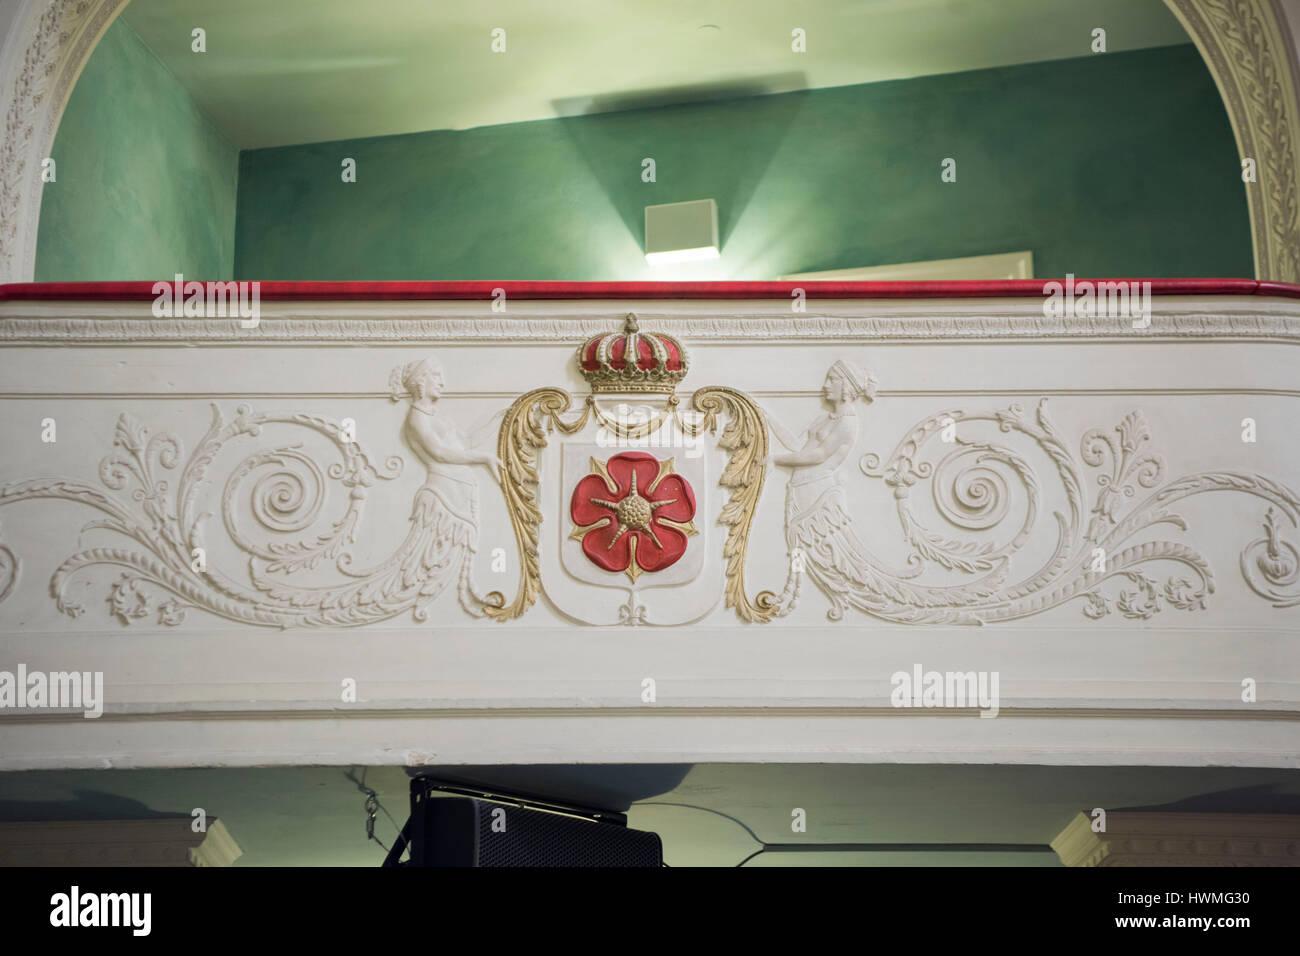 Deutschland, Nordrhein-Westfalen, Detmold, Landestheater Detmold, Wappen Lippe Detmold im Zuschauerraum - Stock Image